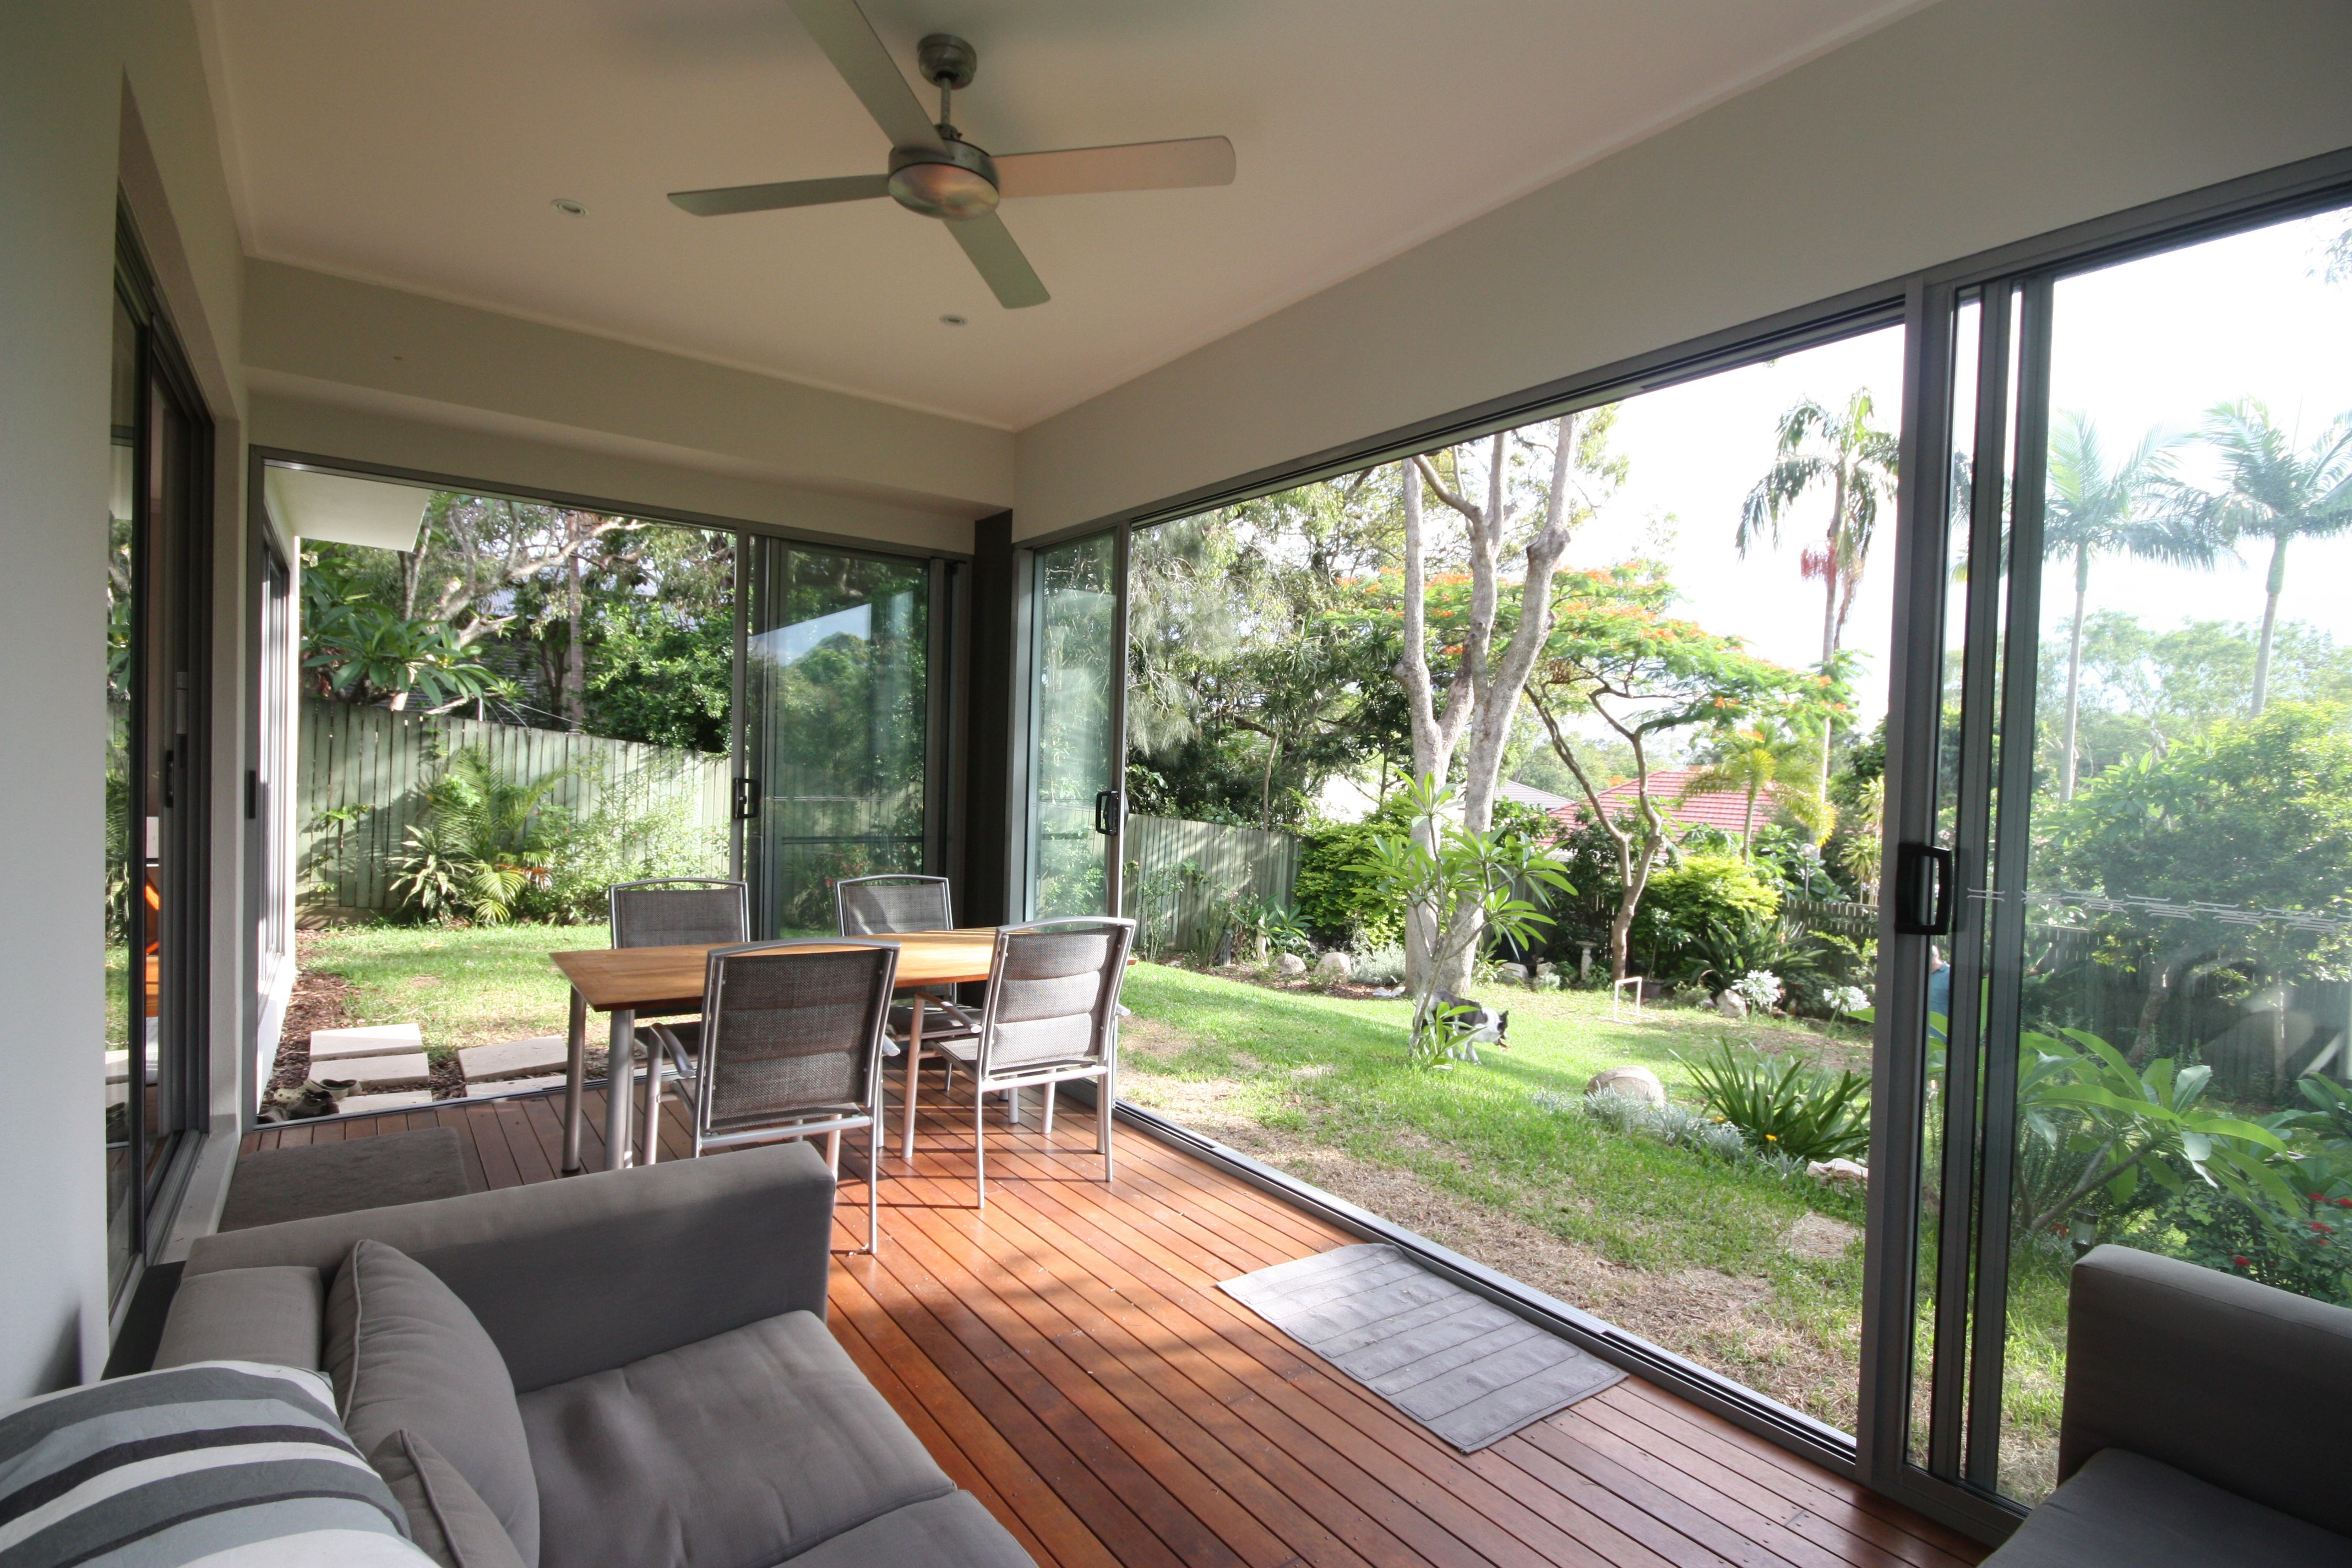 Alfresco Area, Deck, Sliding Doors, Enclosed, Outdoor Dining.